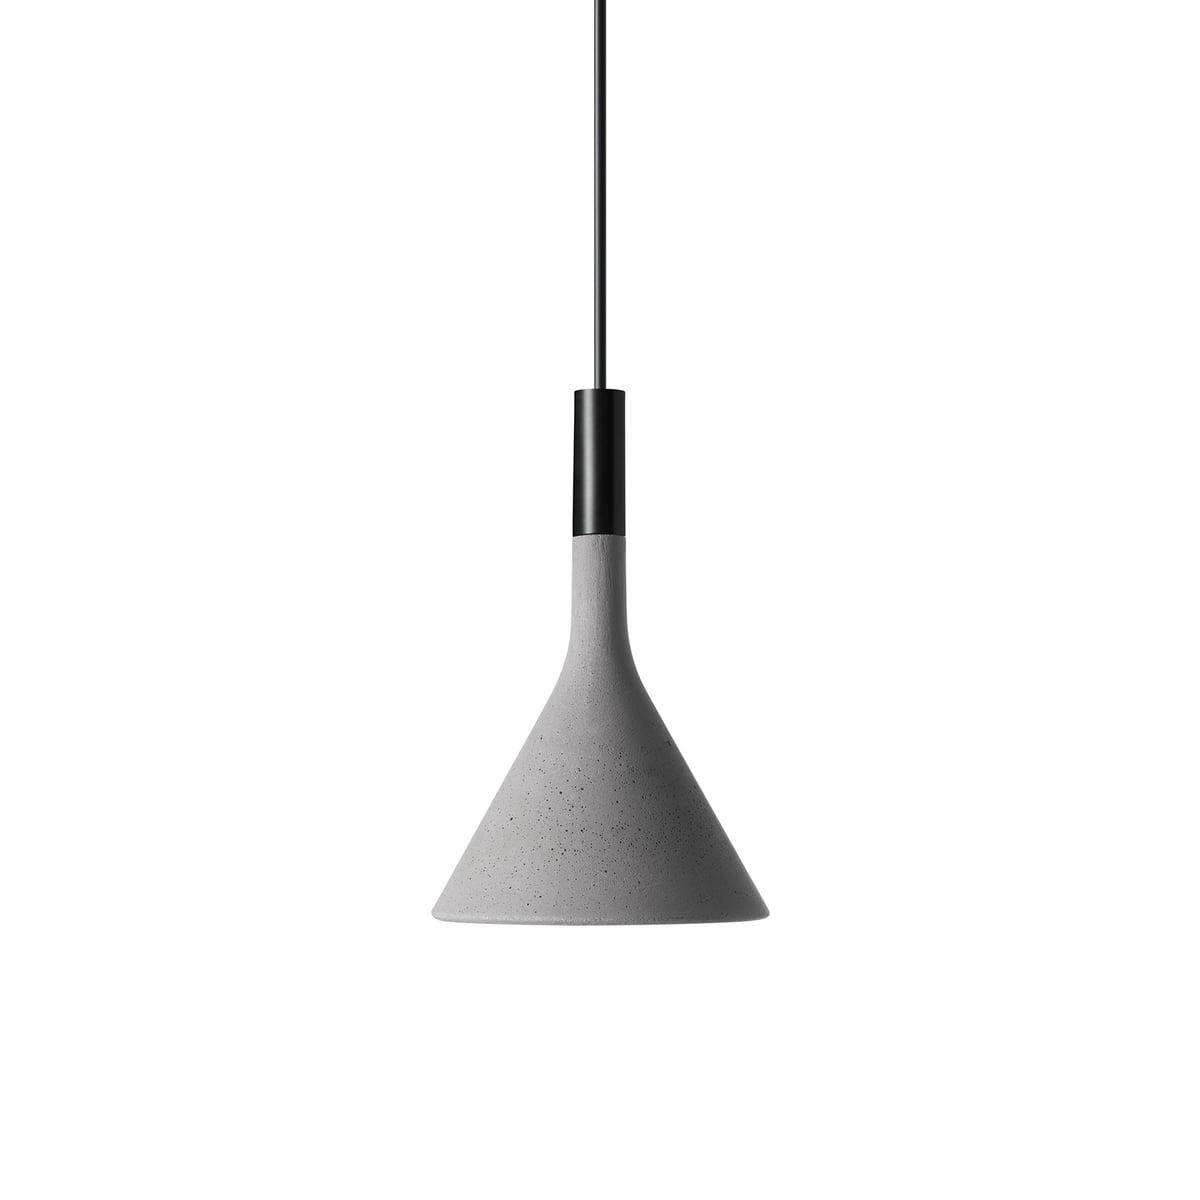 Concrete lamp by foscarini in the shop the aplomb mini by foscarini in gray aloadofball Gallery